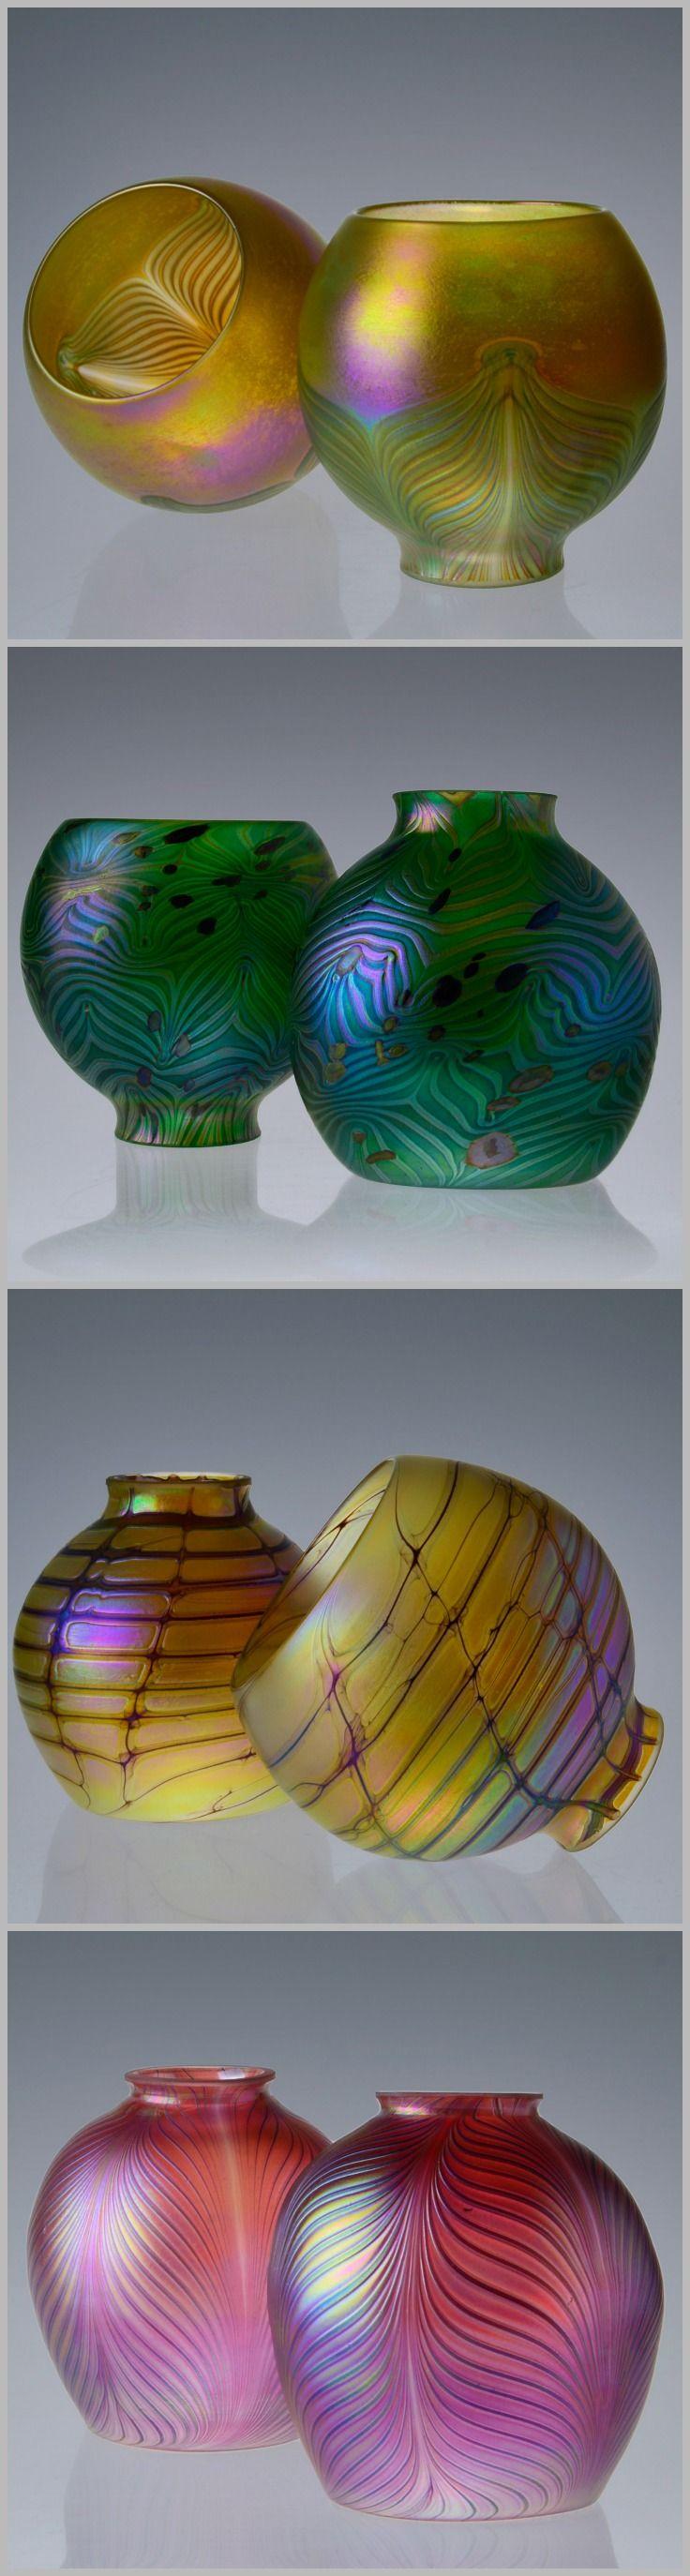 Hand Blown Glass Lamp Shade   Replacement Glass Shade 2.25'' Fitter   Art Nouveau Shades   Bohemian Lamp Shade https://www.etsy.com/shop/IricapeGlass